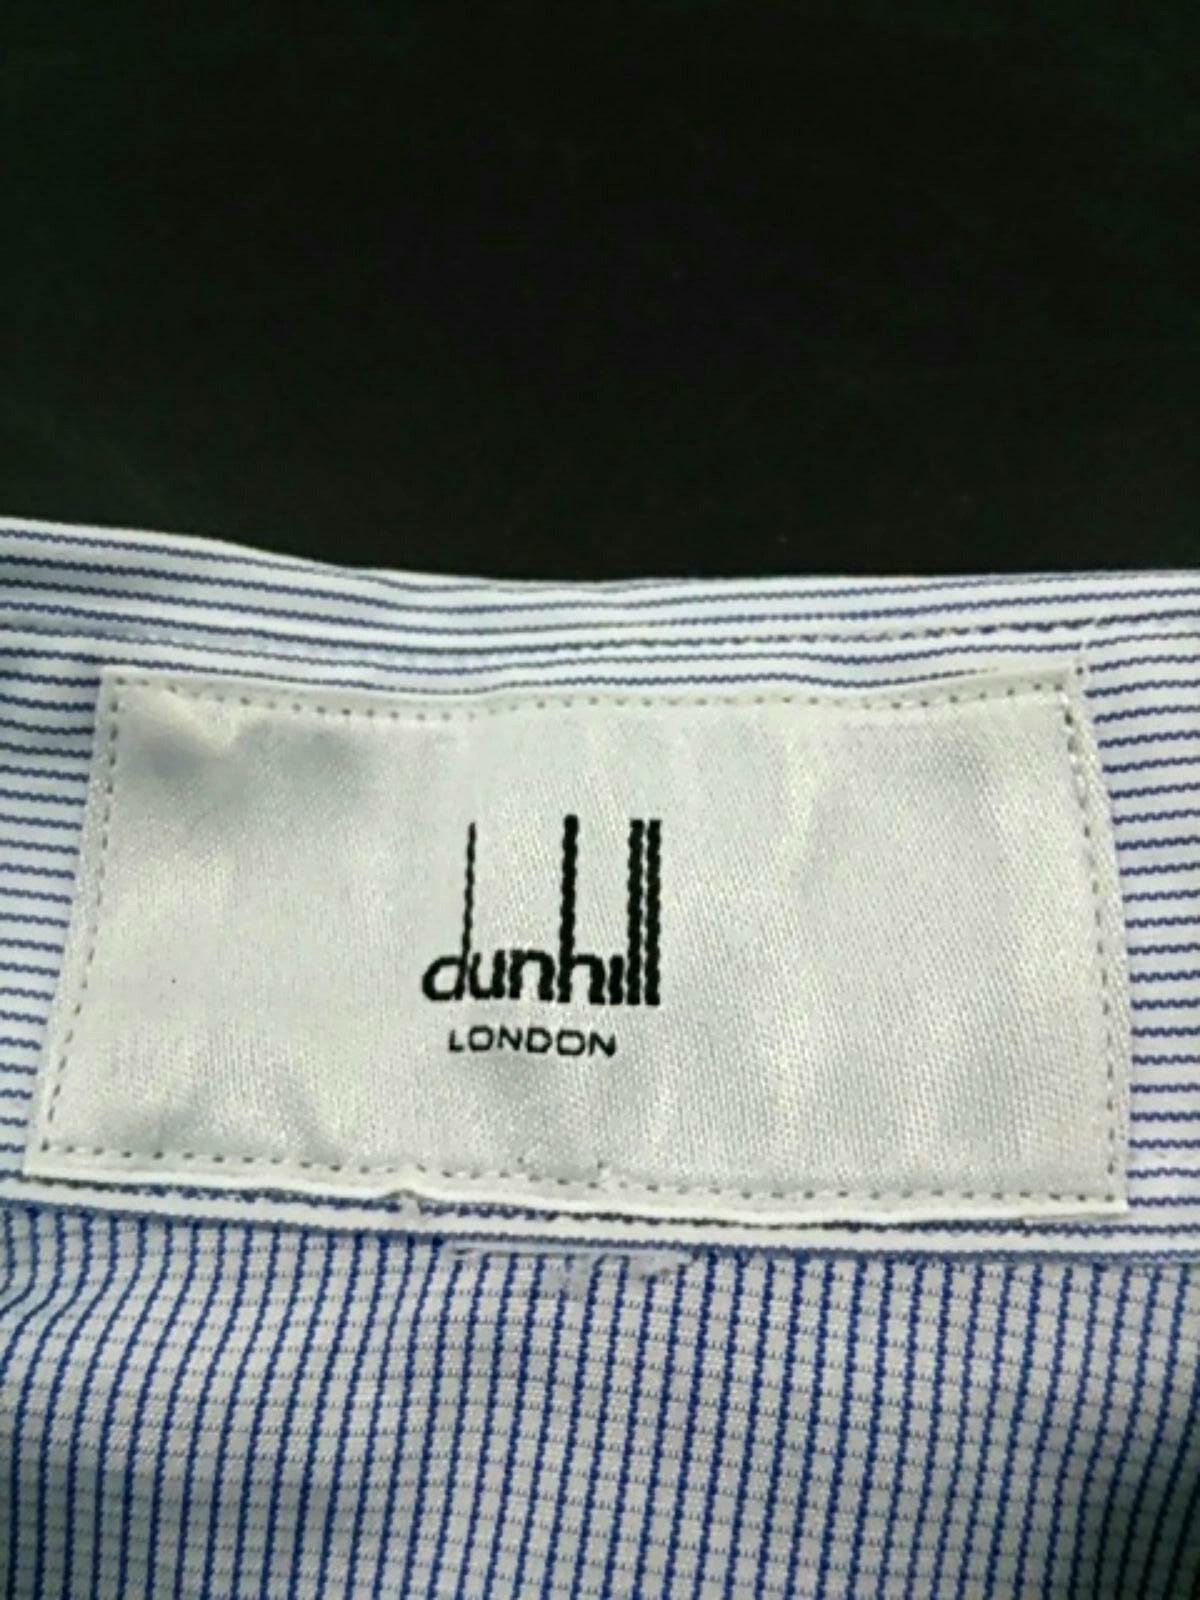 dunhill/ALFREDDUNHILL(ダンヒル)のシャツブラウス